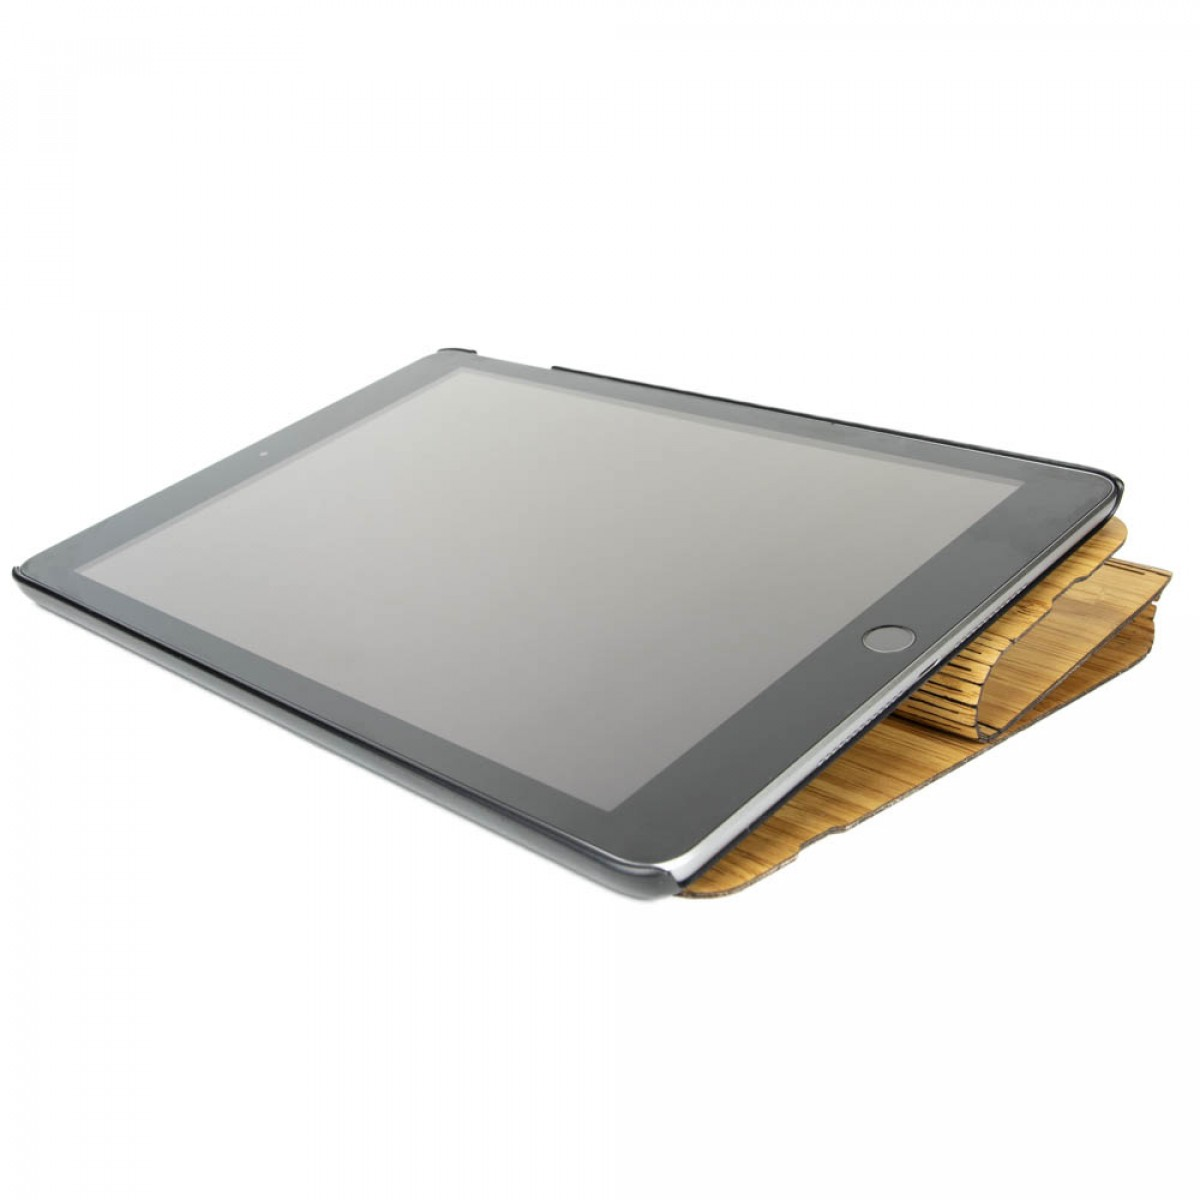 JUNGHOLZ Design WoodCase, Tablet, Bambus, iPad 5. & 6. Generation